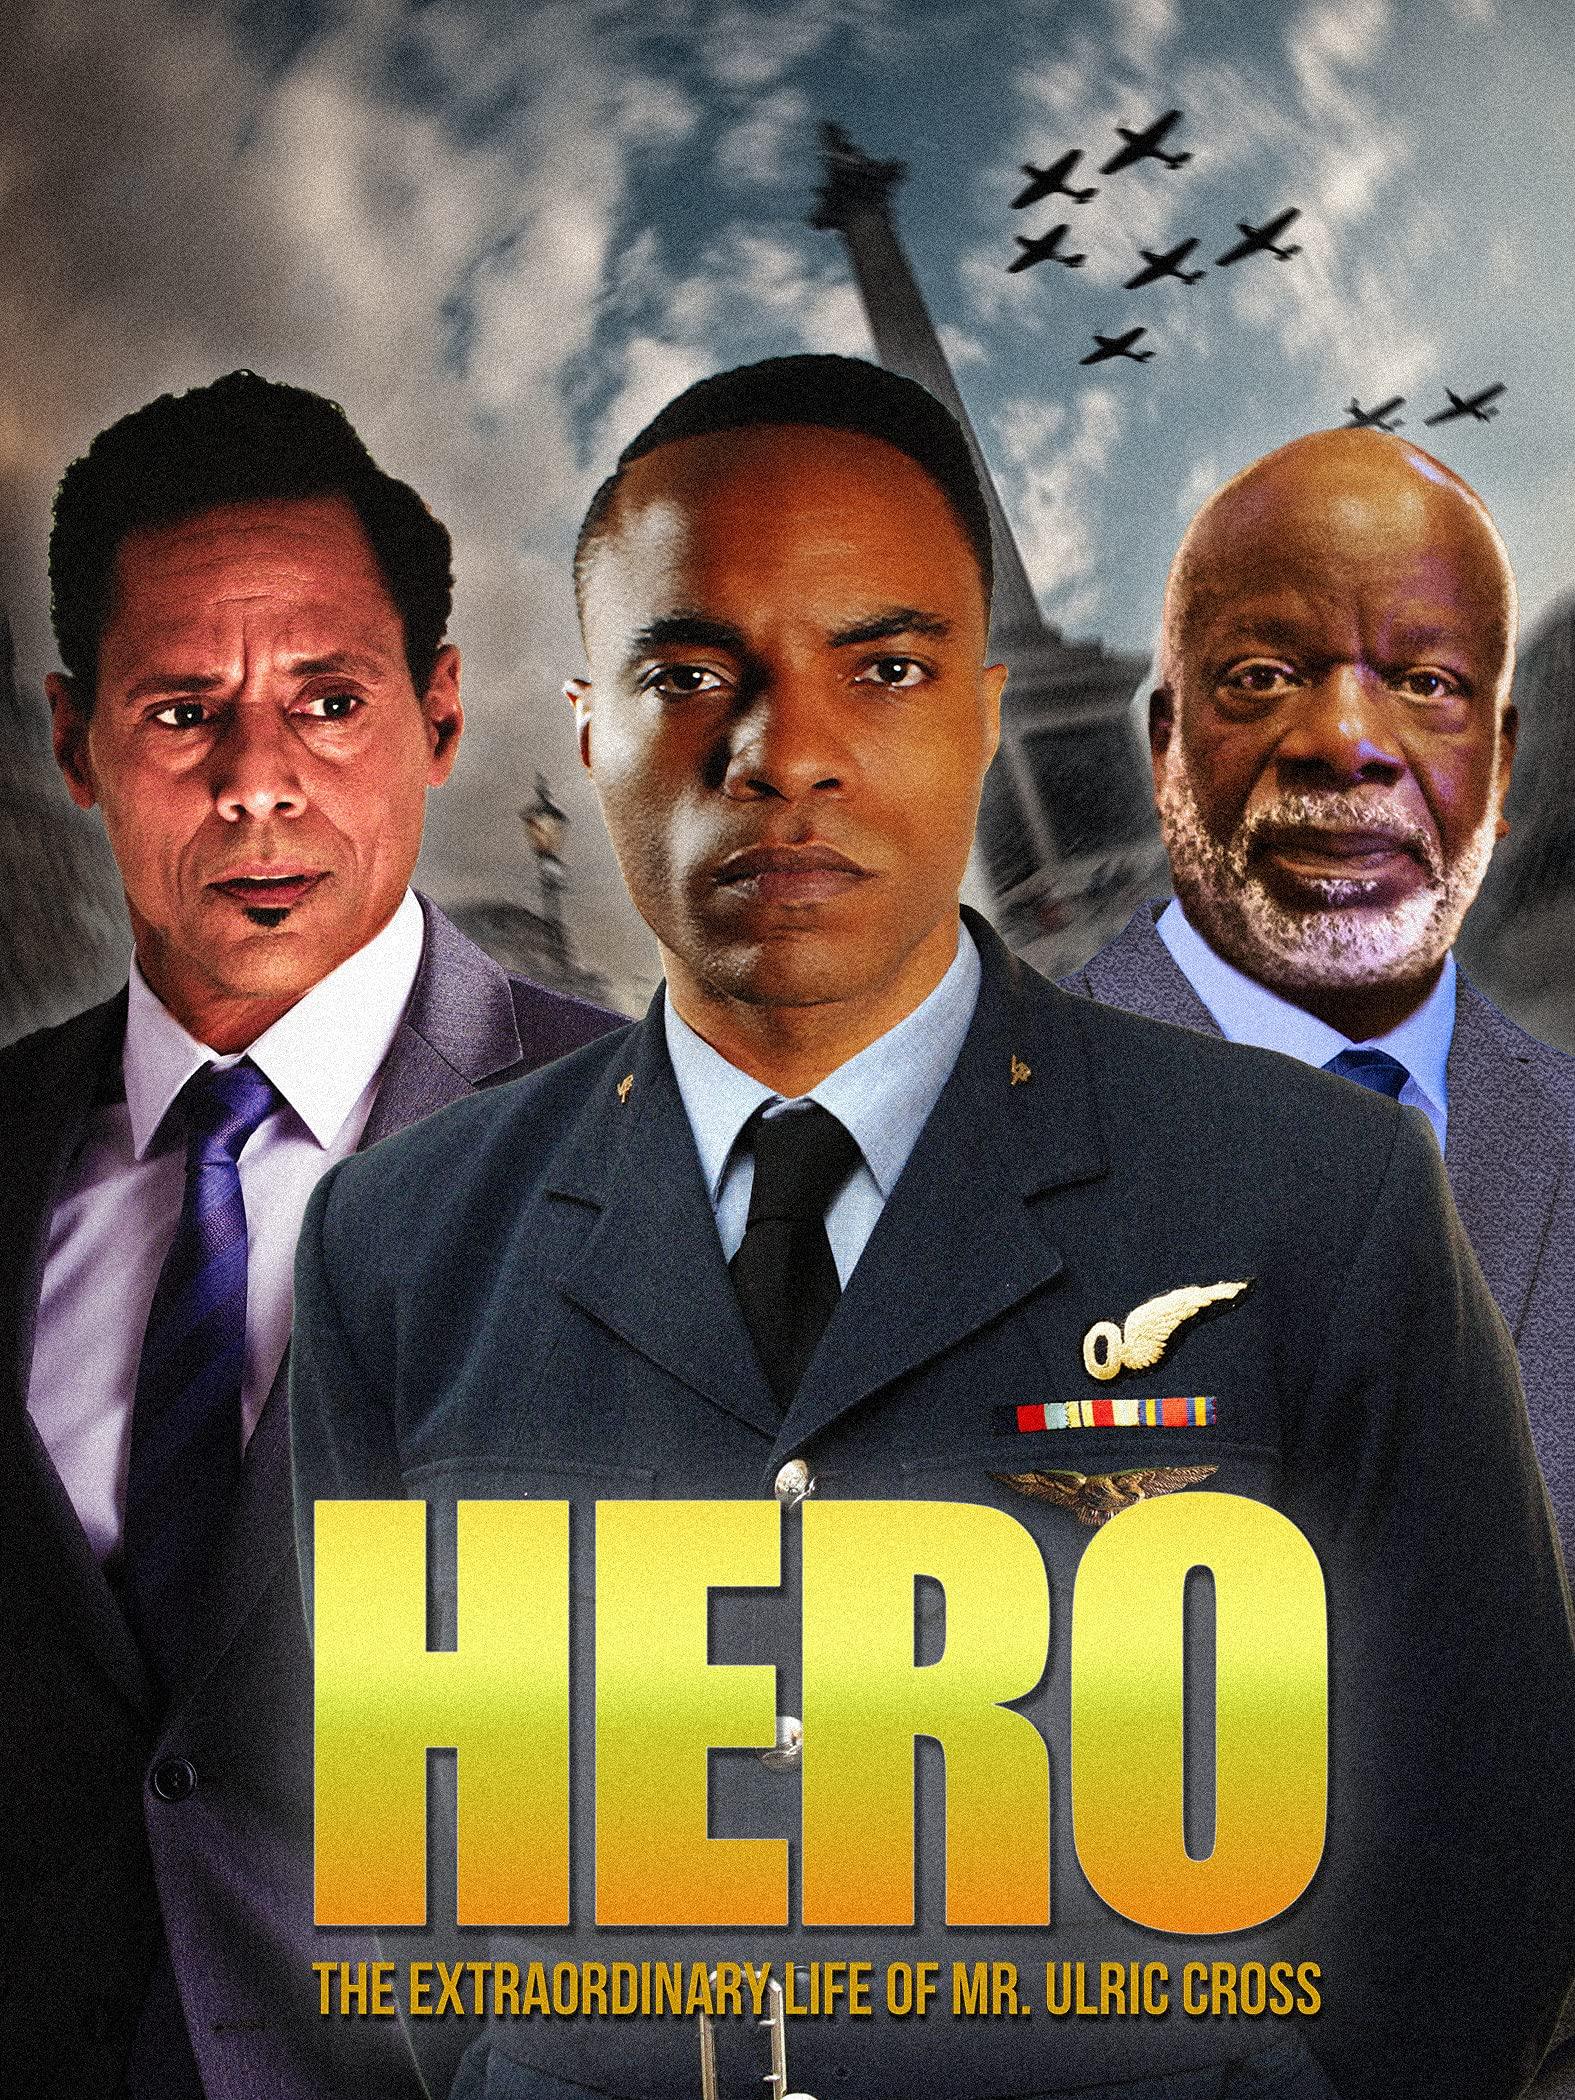 Hero: The Extraordinary Life of Mr. Ulric Cross